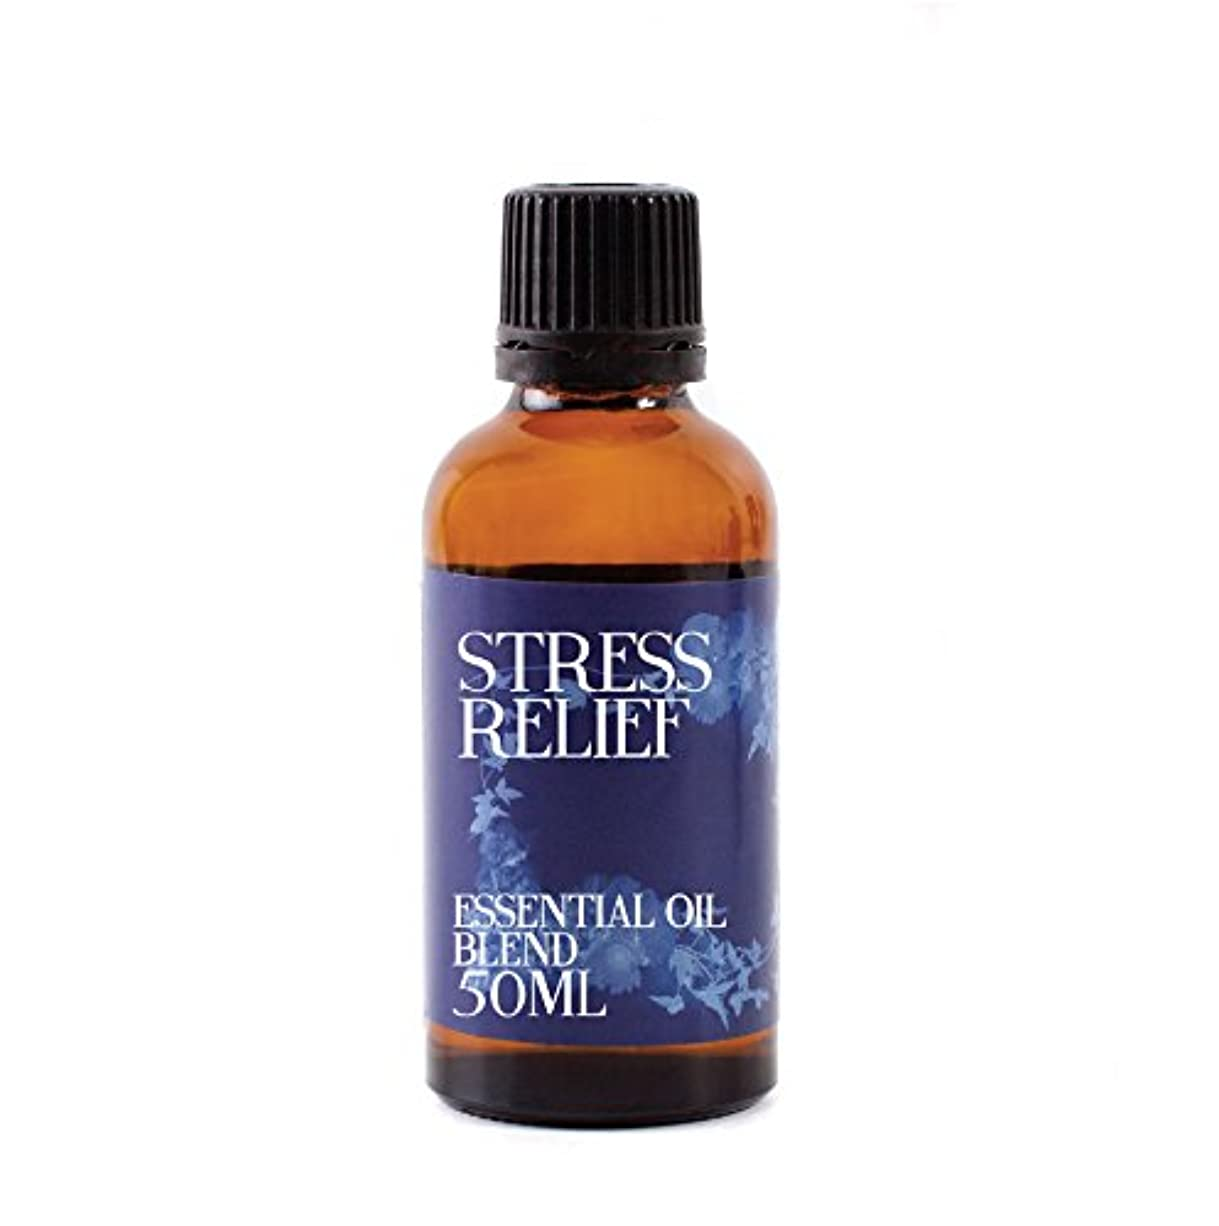 Mystix London   Stress Relief Essential Oil Blend - 50ml - 100% Pure